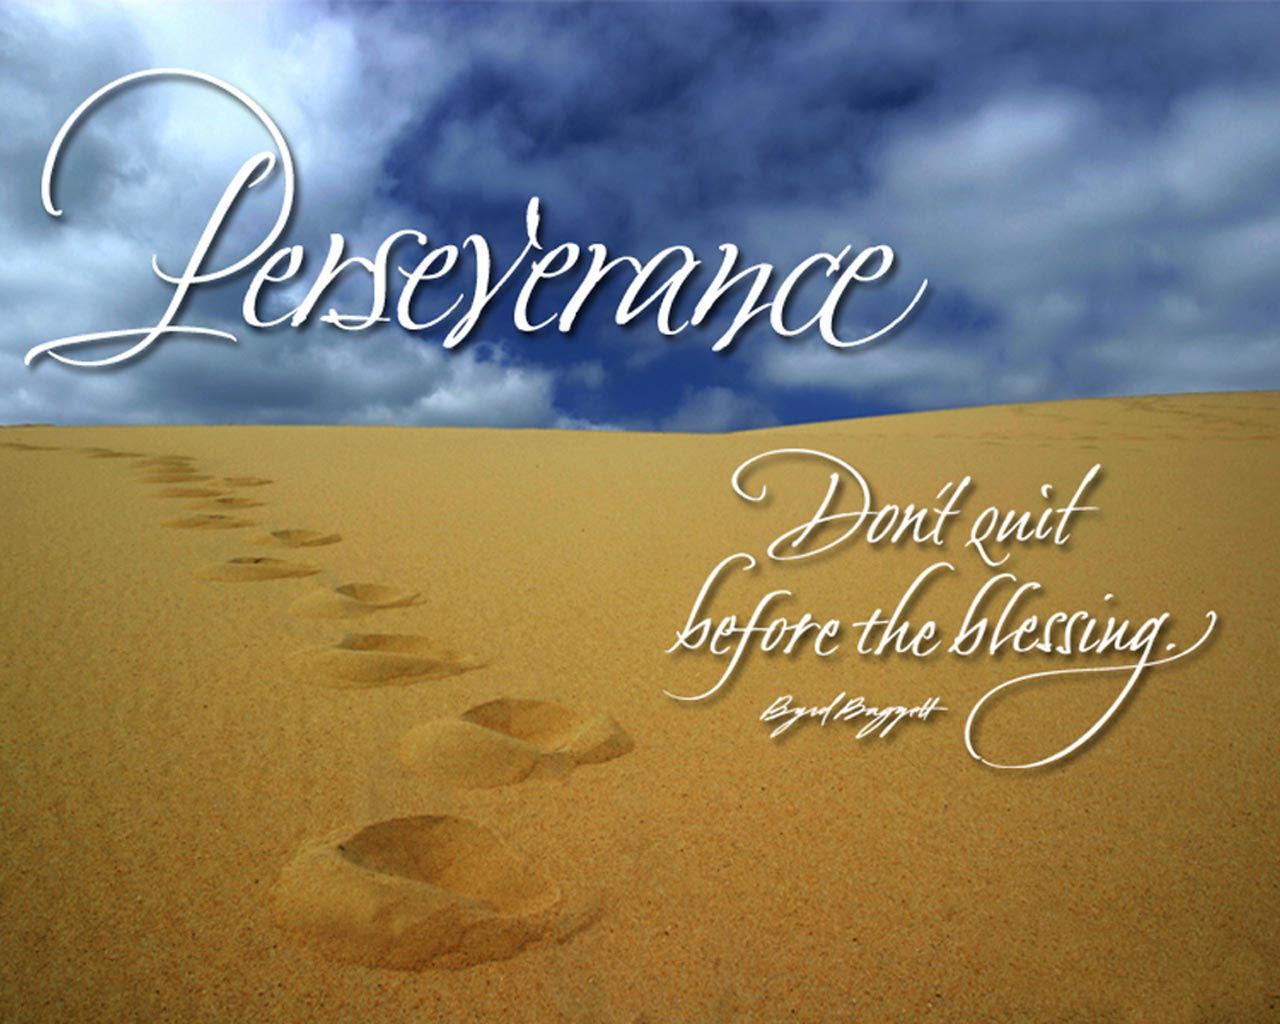 perseverance-ann